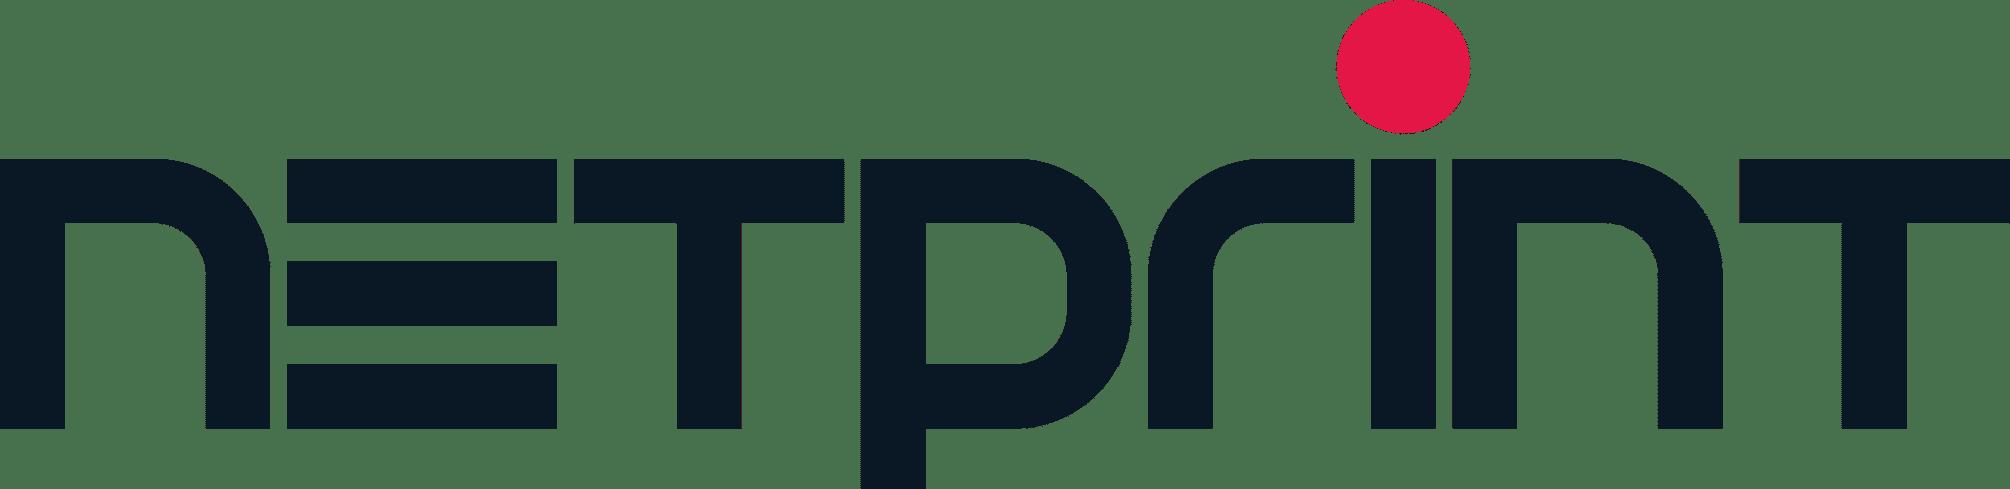 Netprint logo PNG